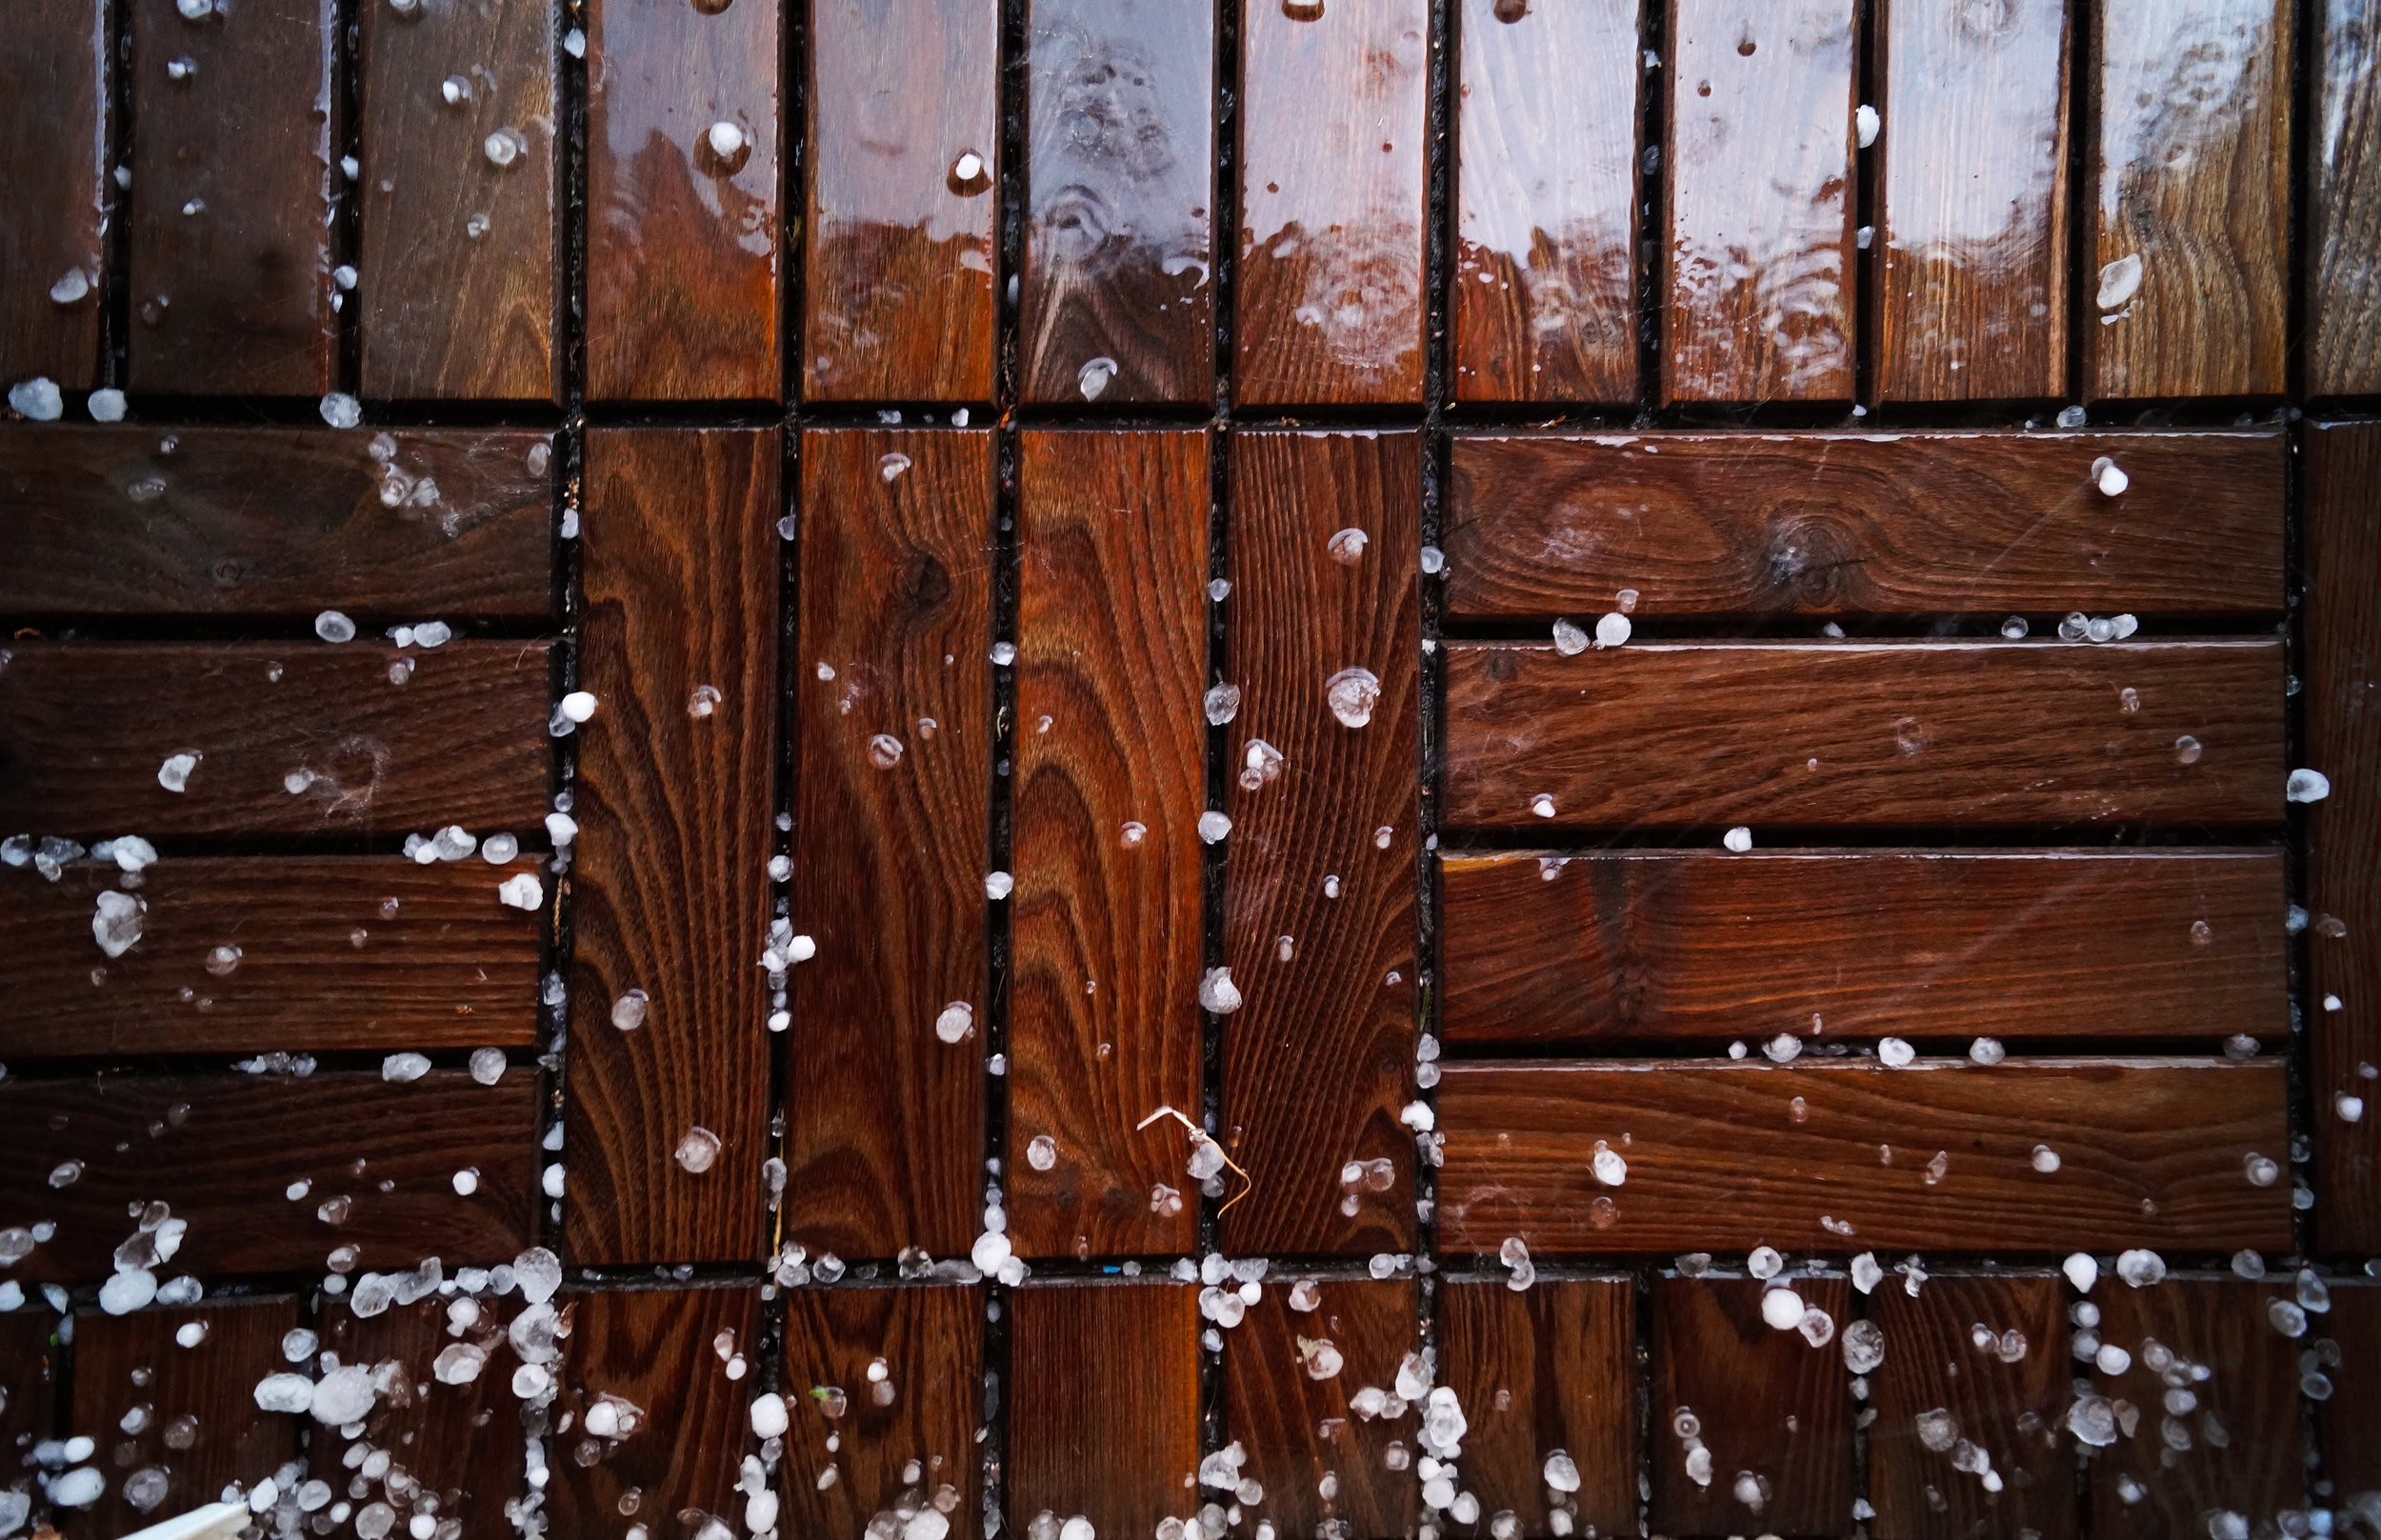 floor-ice-rain-42160.jpg